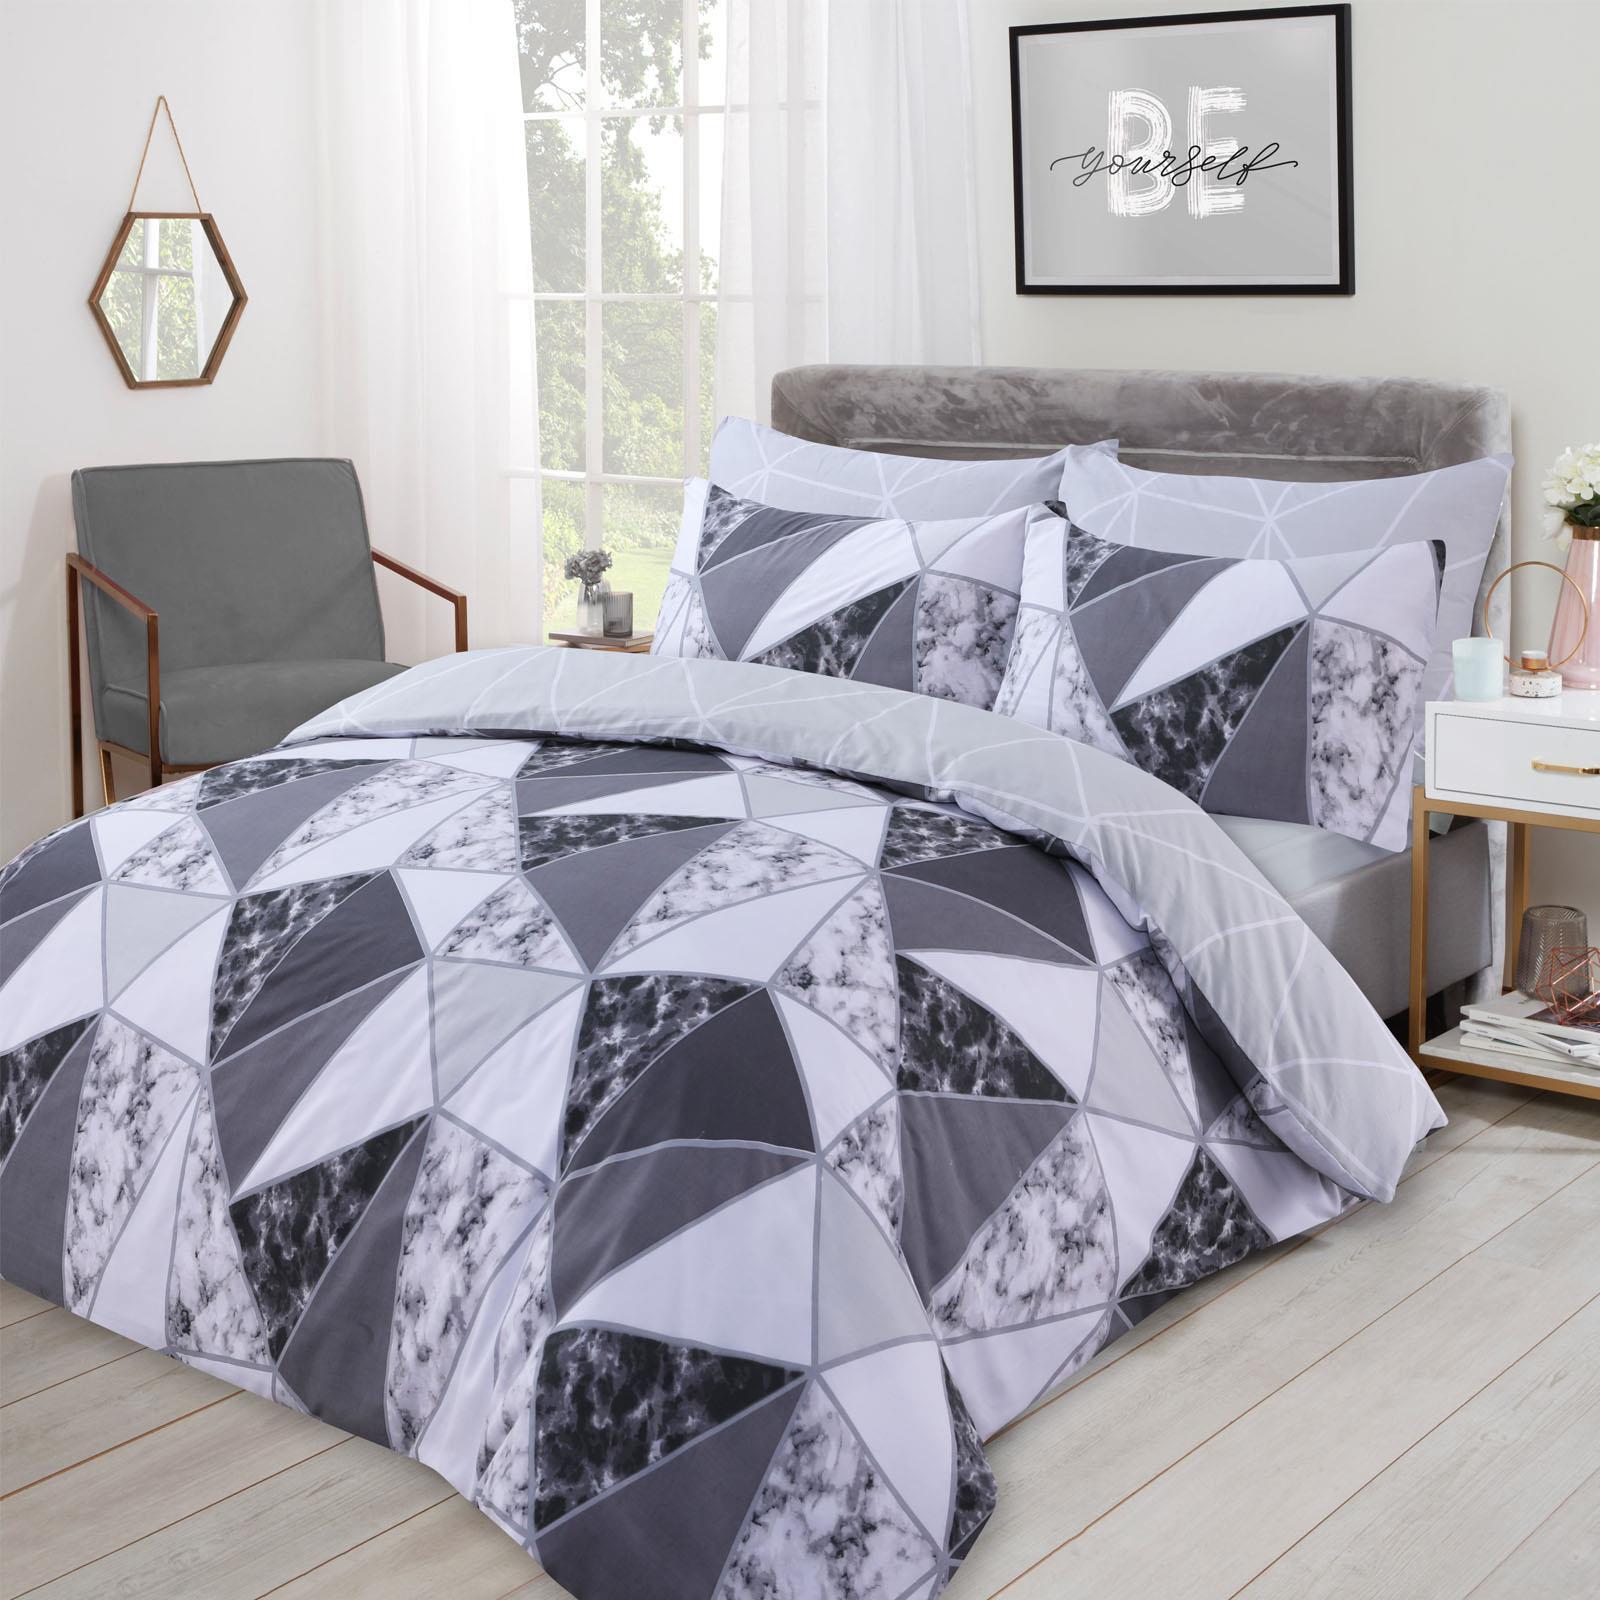 thumbnail 13 - Dreamscene Marble Geometric Duvet Cover with Pillowcase Bedding Set Grey Blush